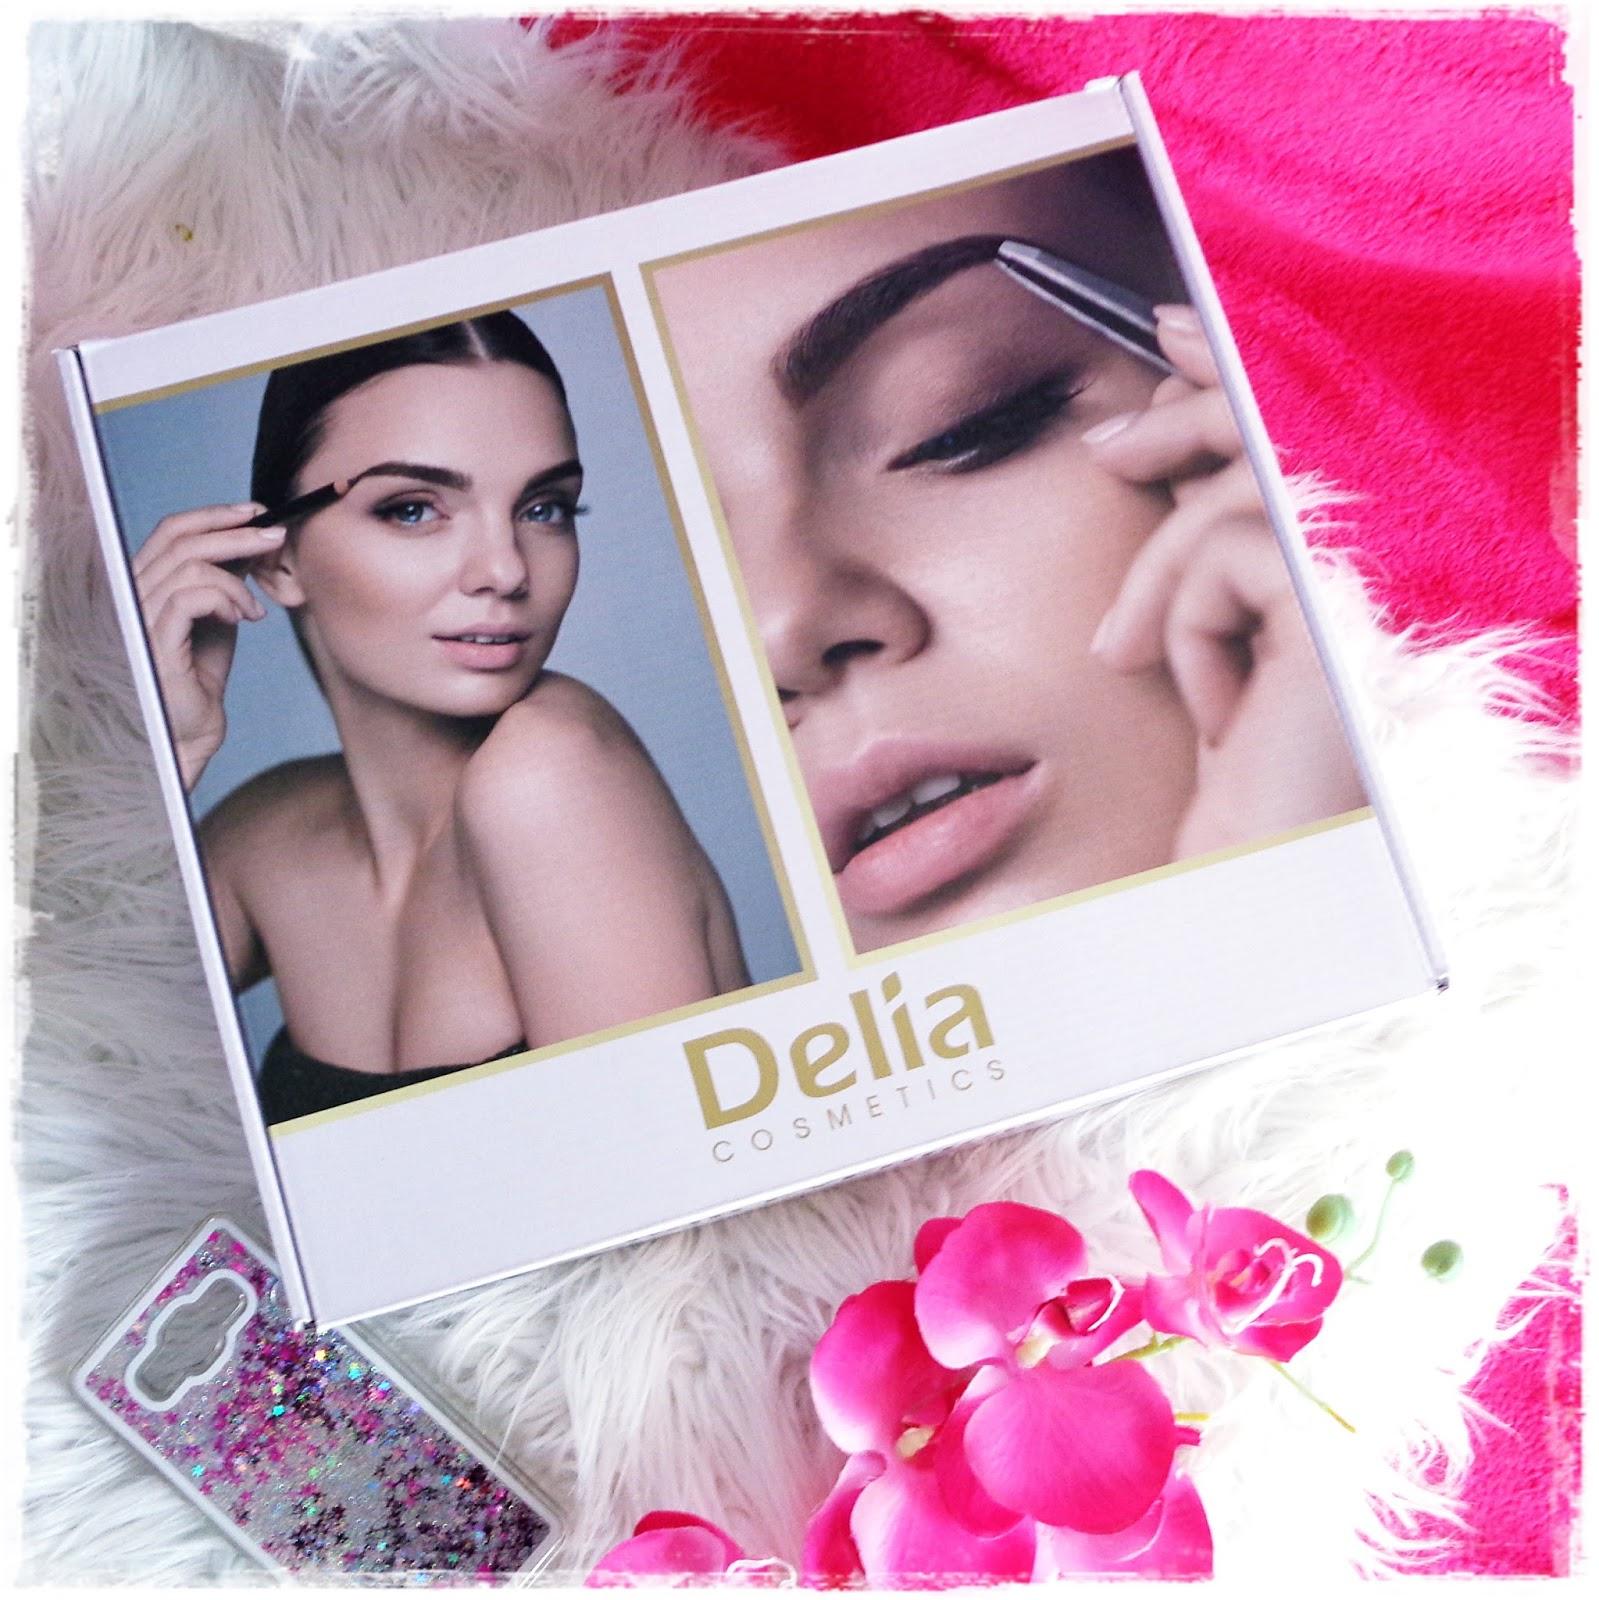 Delia, Find Your Eyebrow Expert! Paczka Ambasadorska